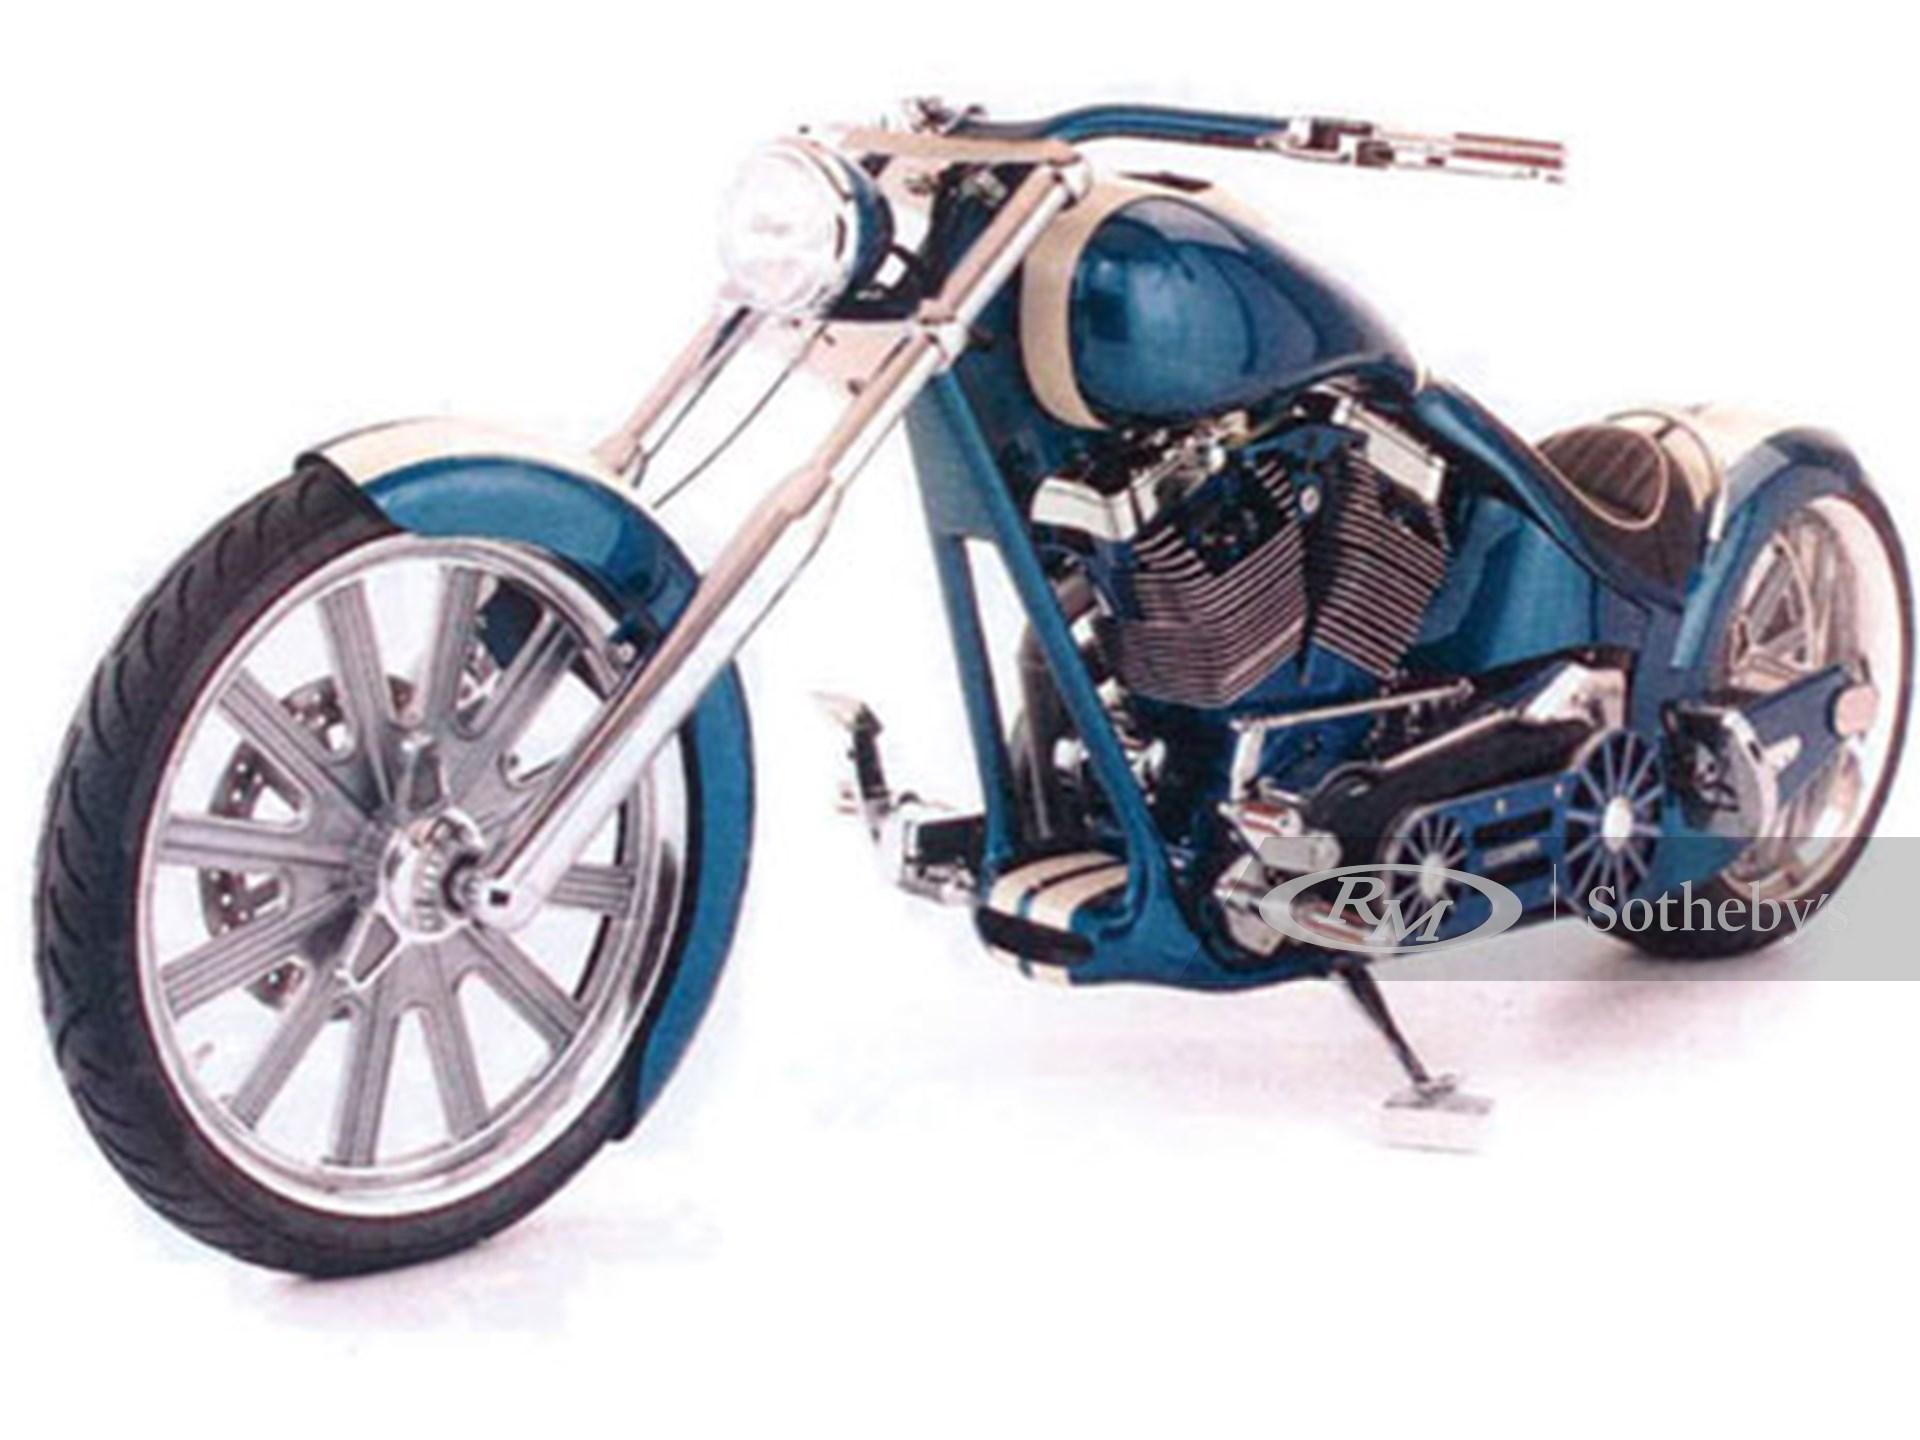 2007 Custom Motorcycle Built for Carroll Shelby